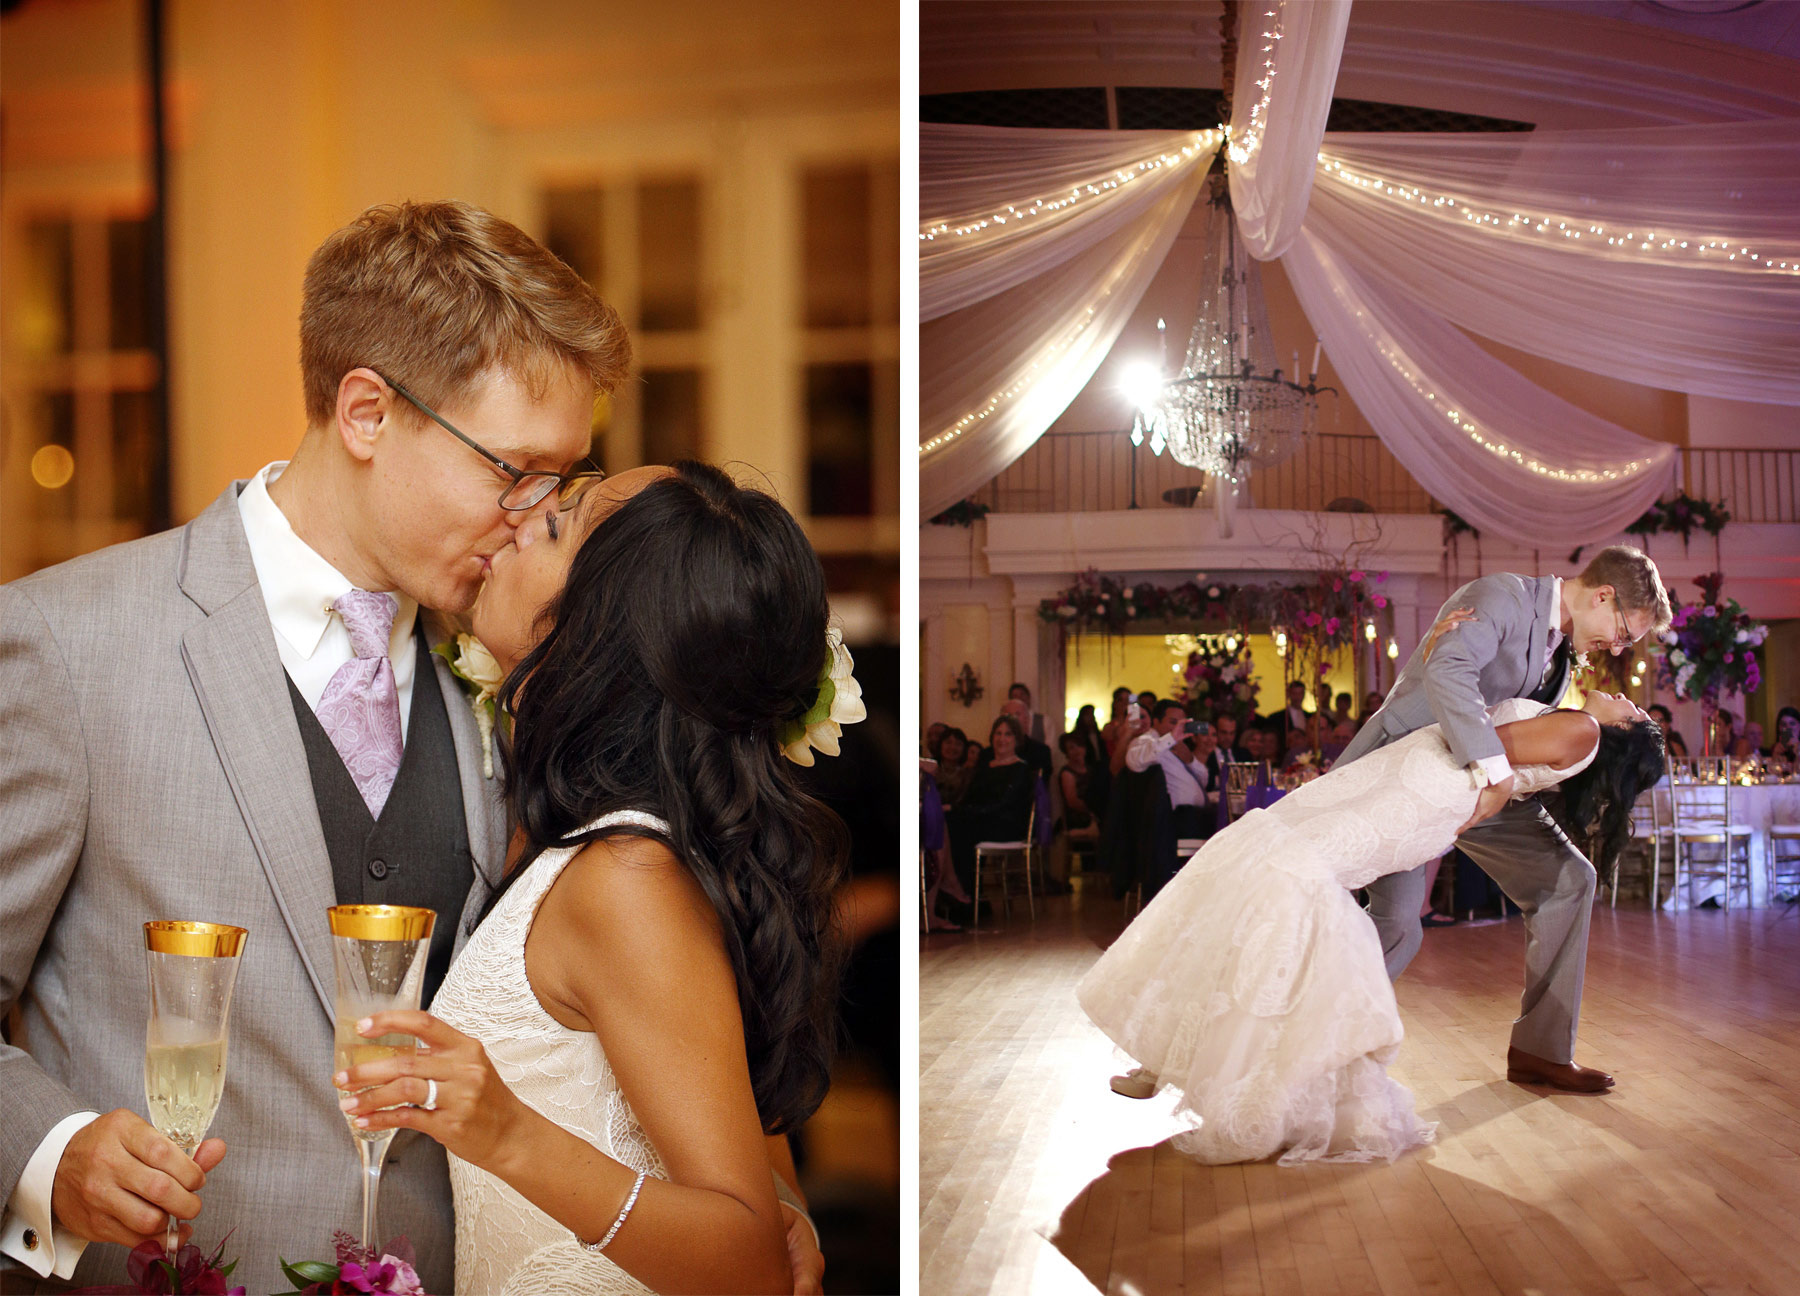 15-Minneapolis-Minnesota-Wedding-Photography-by-Vick-Photography-Lafayette-Country-Club-Reception-Daphne-&-Austin.jpg